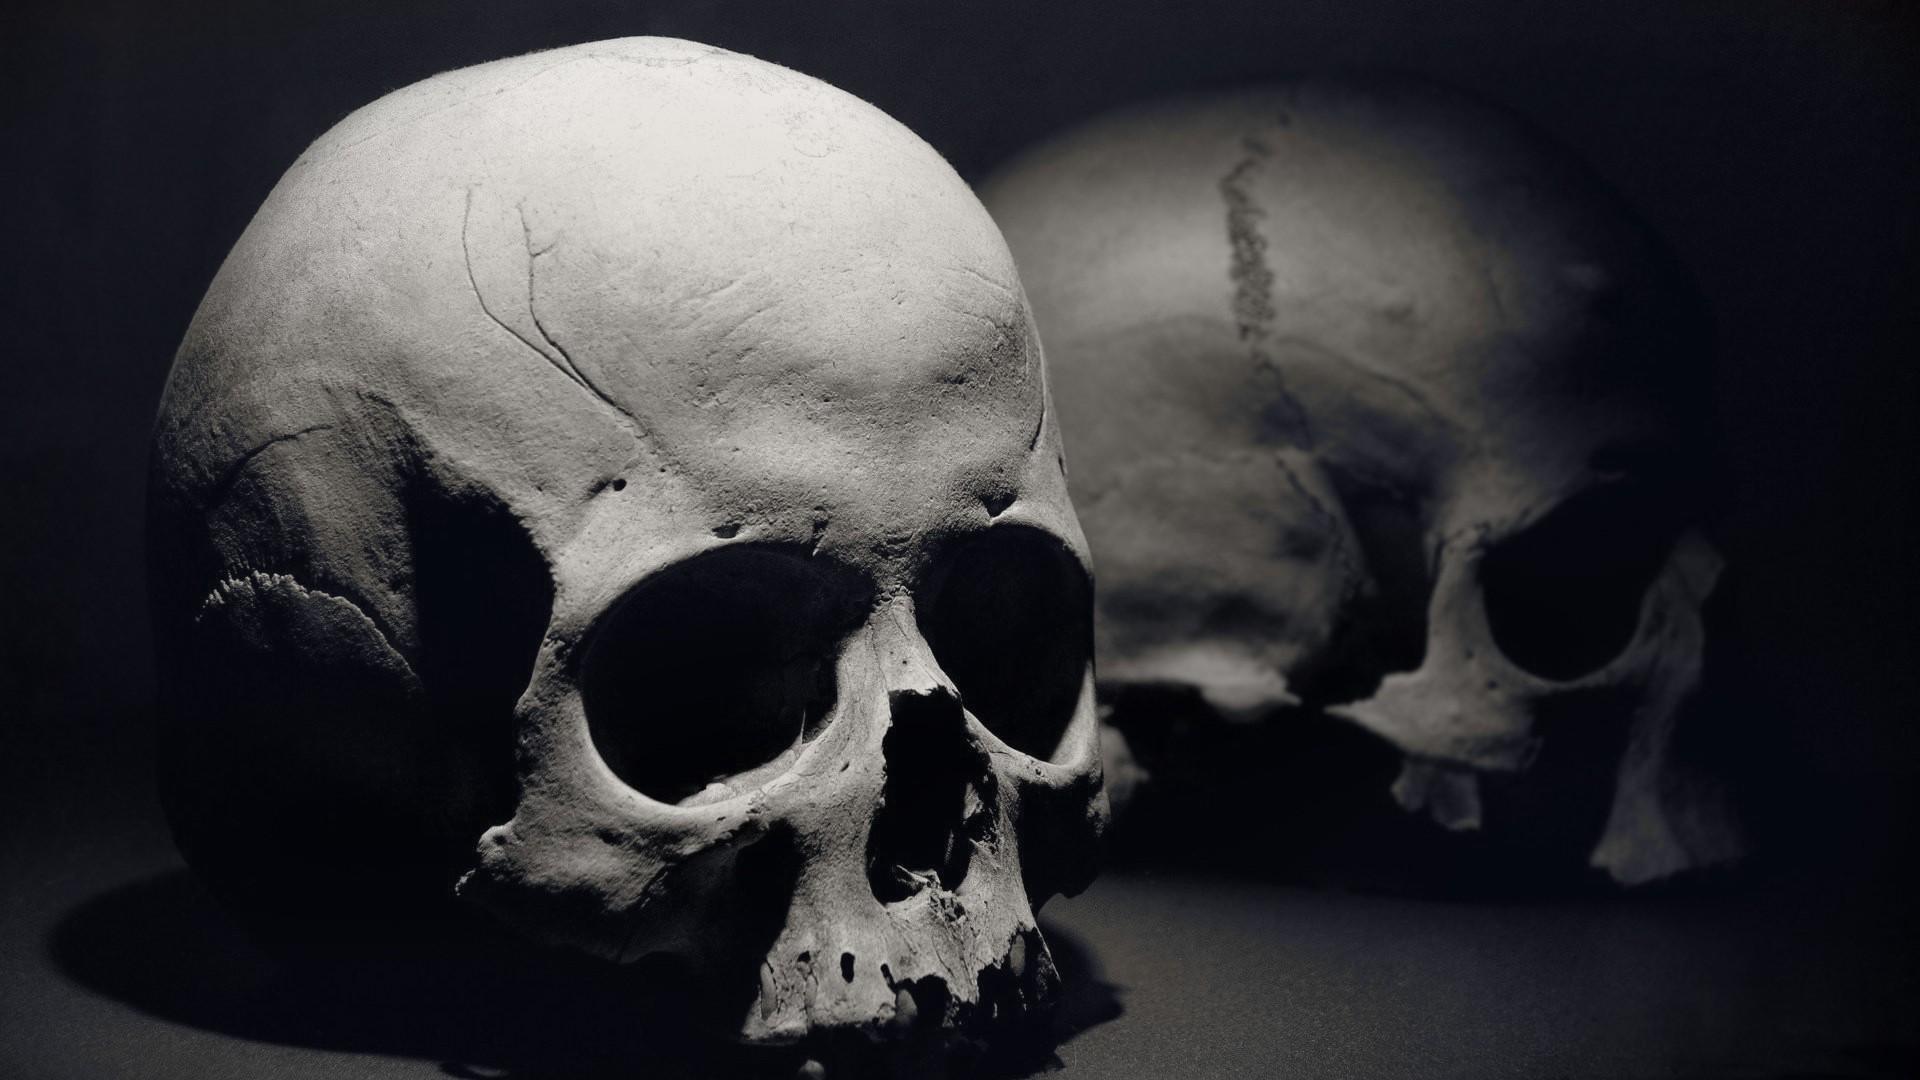 Skull Wallpaper; Skull Wallpaper; Skull Wallpaper ...